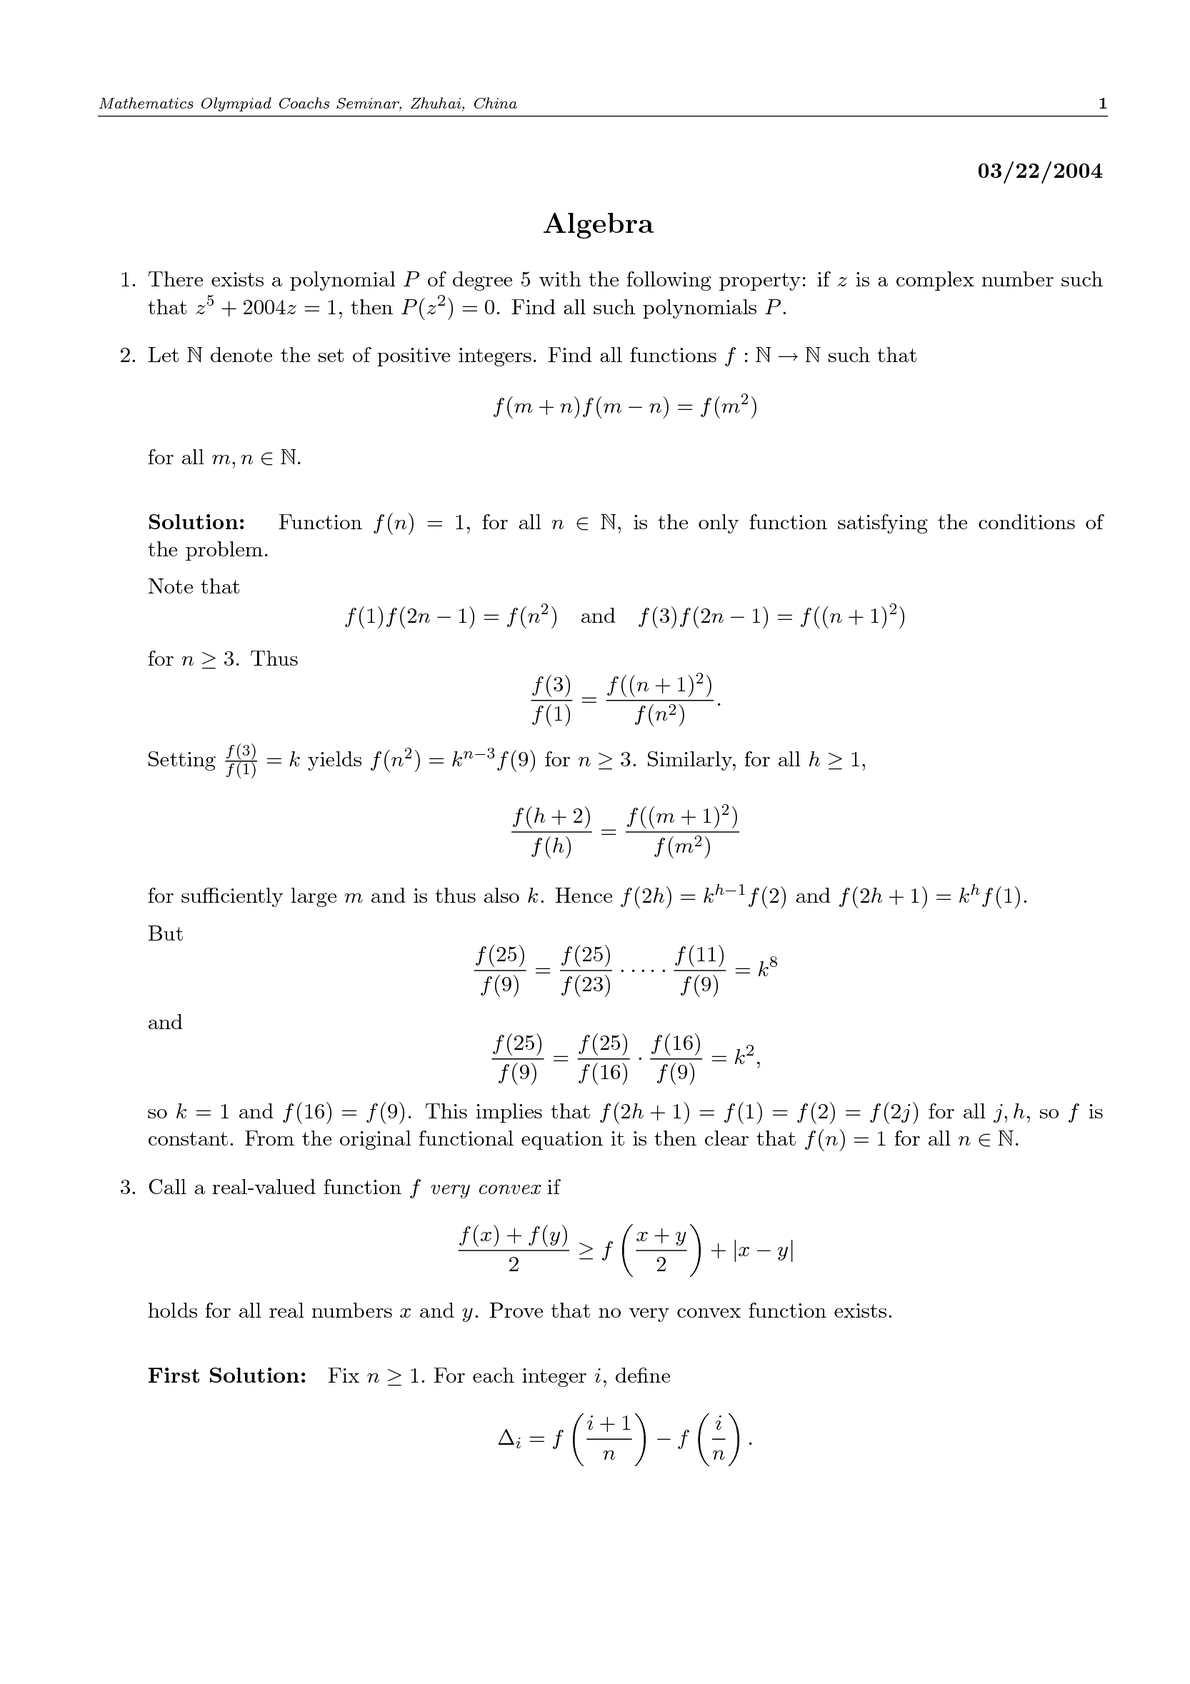 Zhuhai - Mathematics Olympiad Coachs Seminar